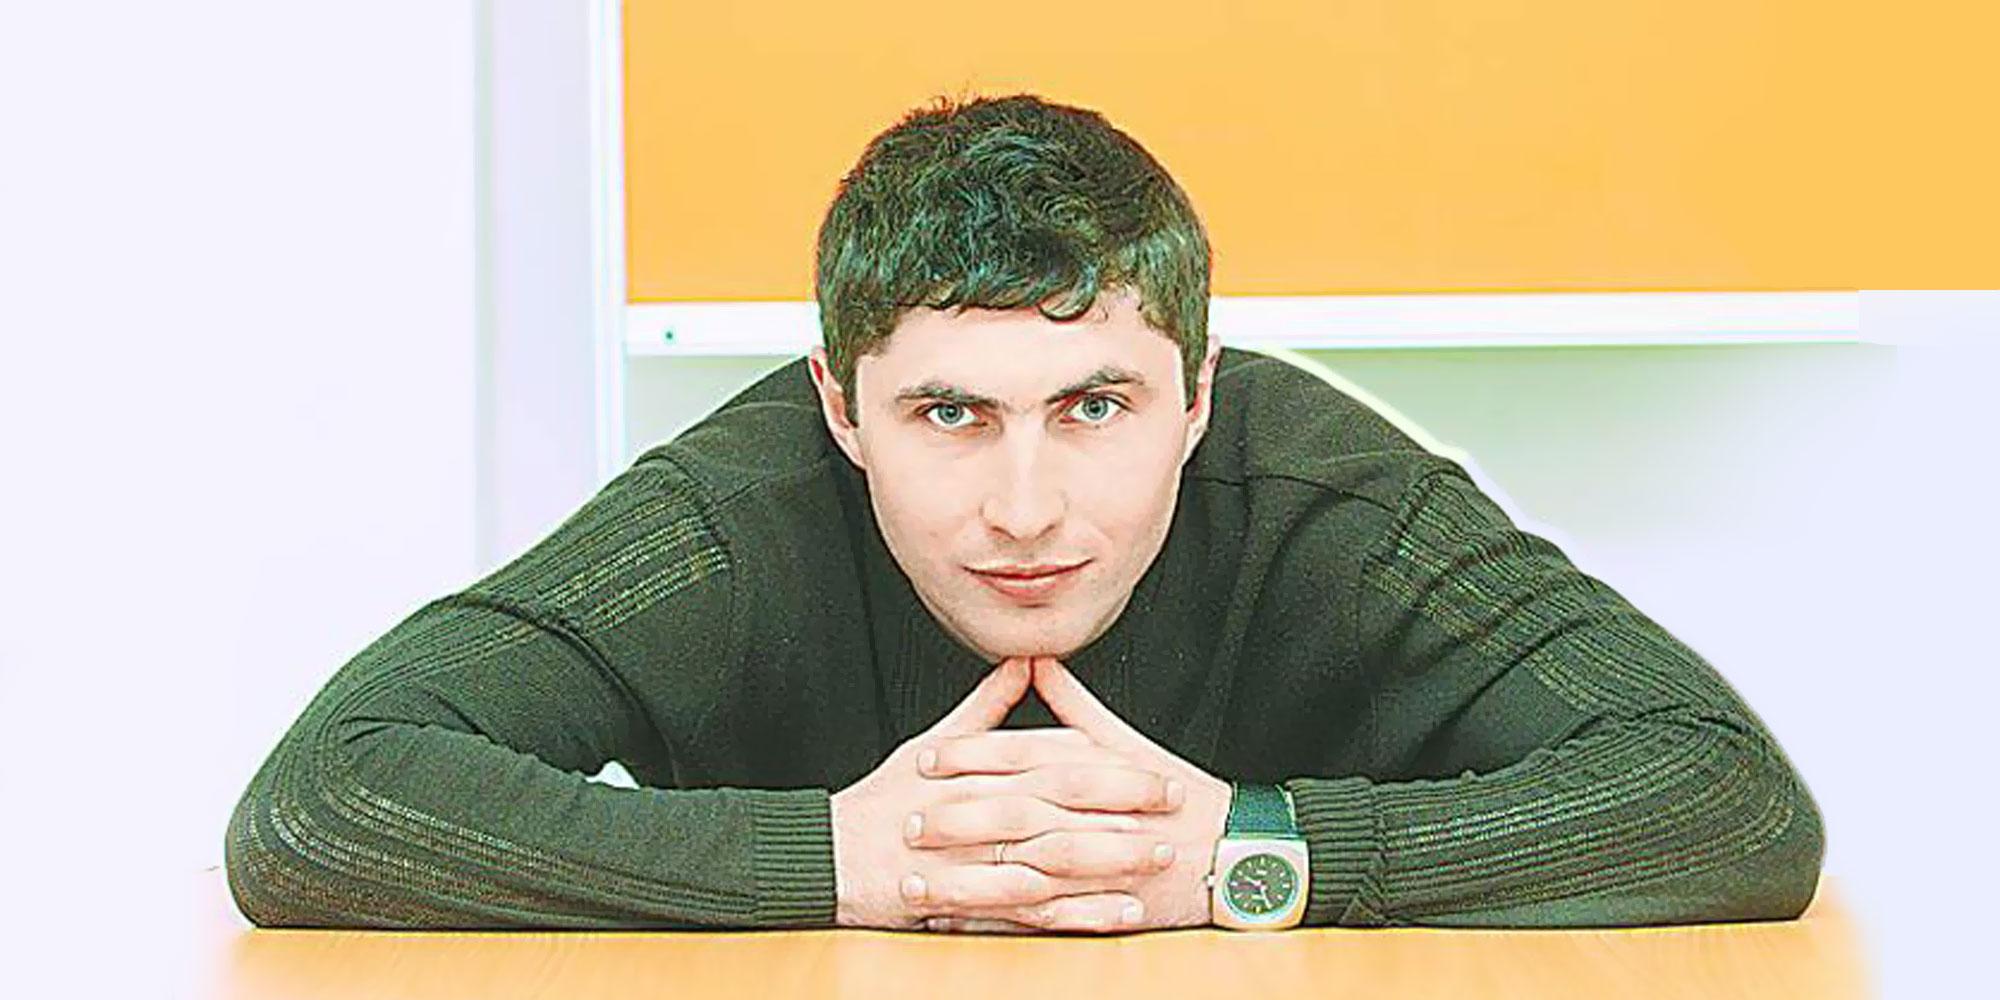 alex_sysoev